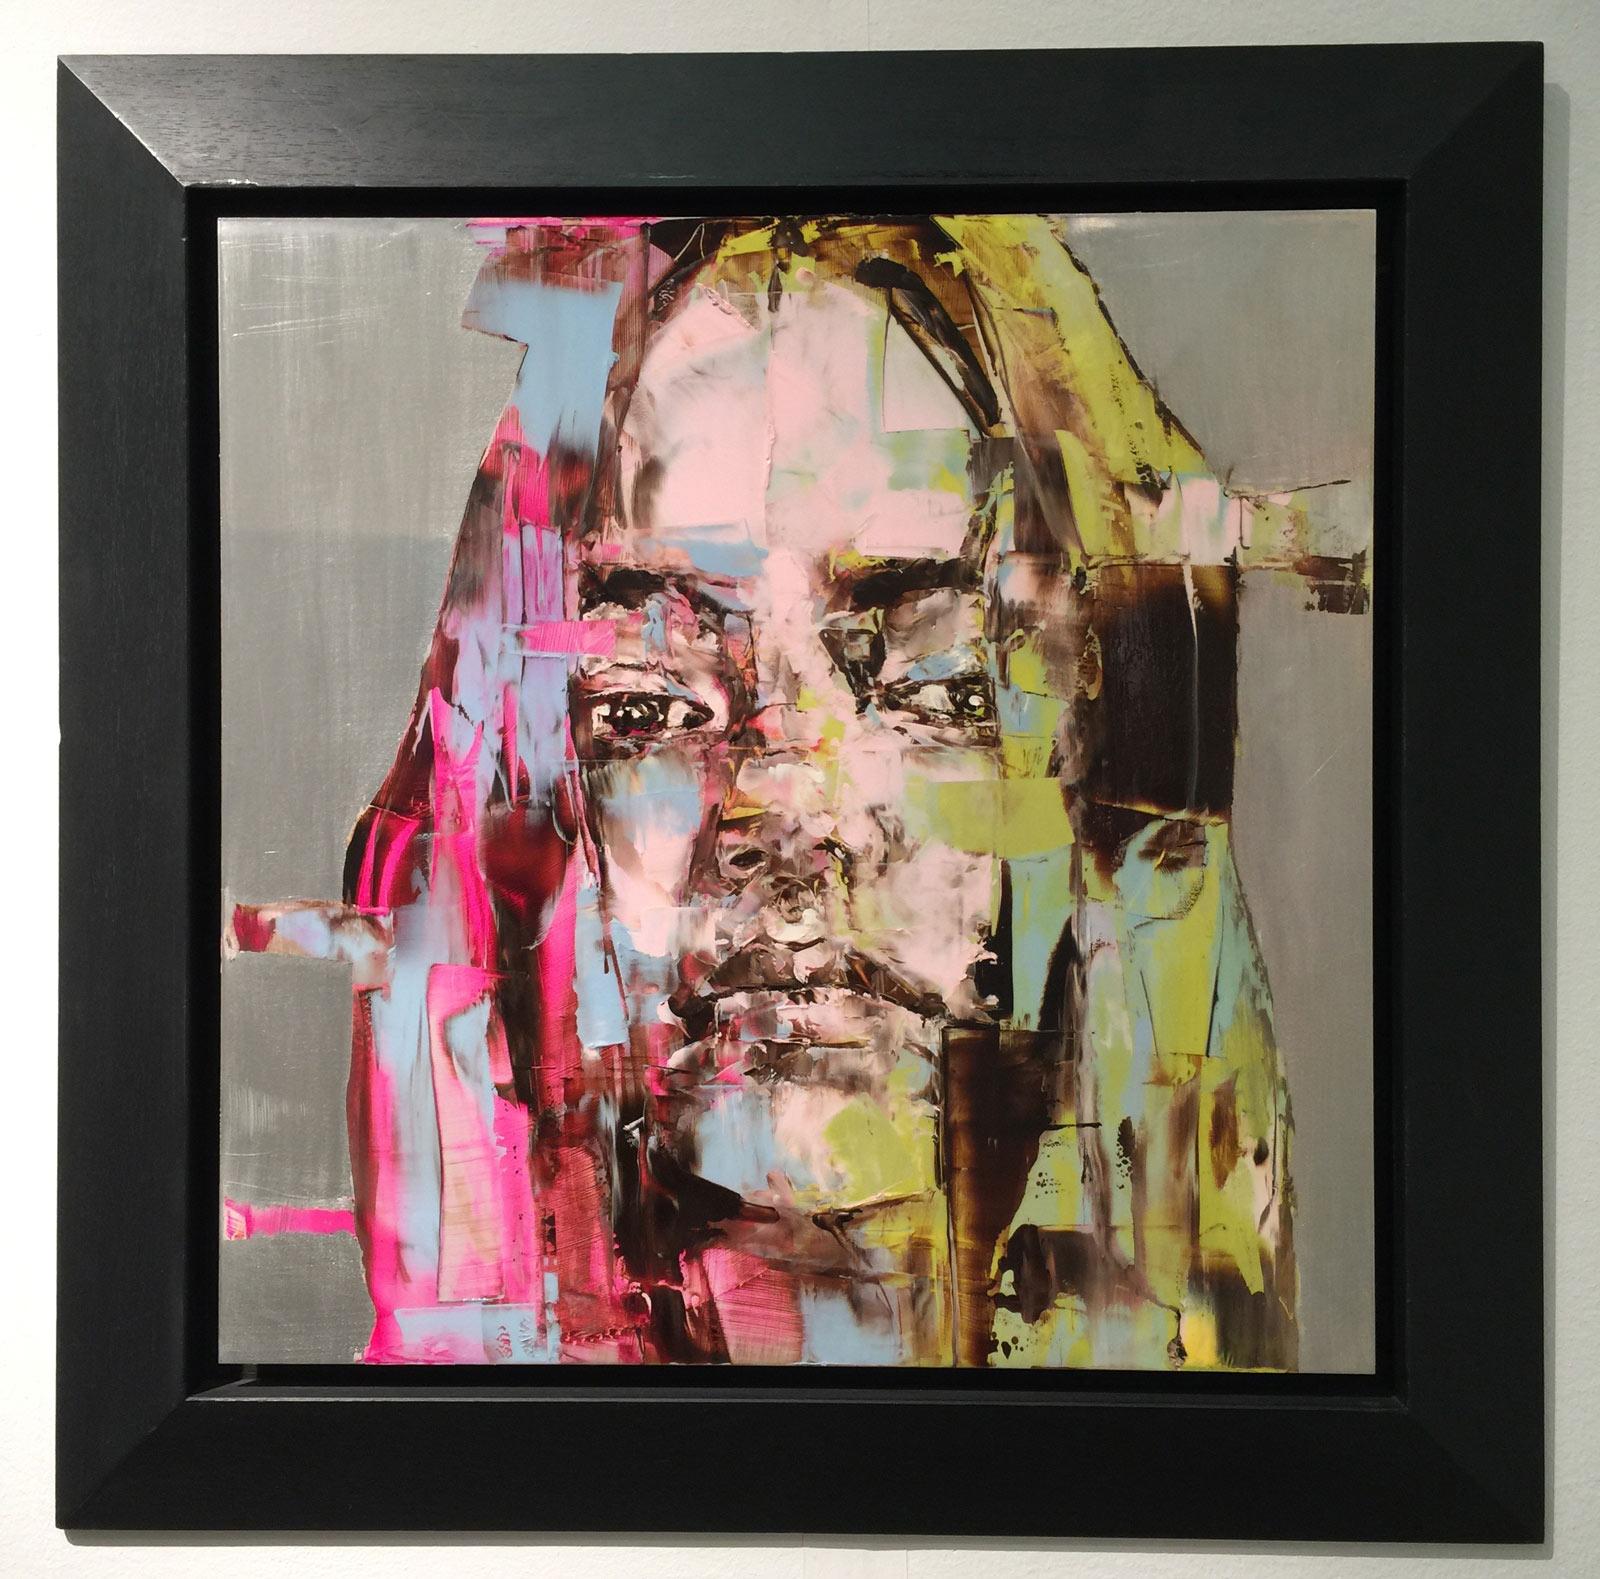 Marco-Grassi-portrait-Liquid-Art-System.jpg